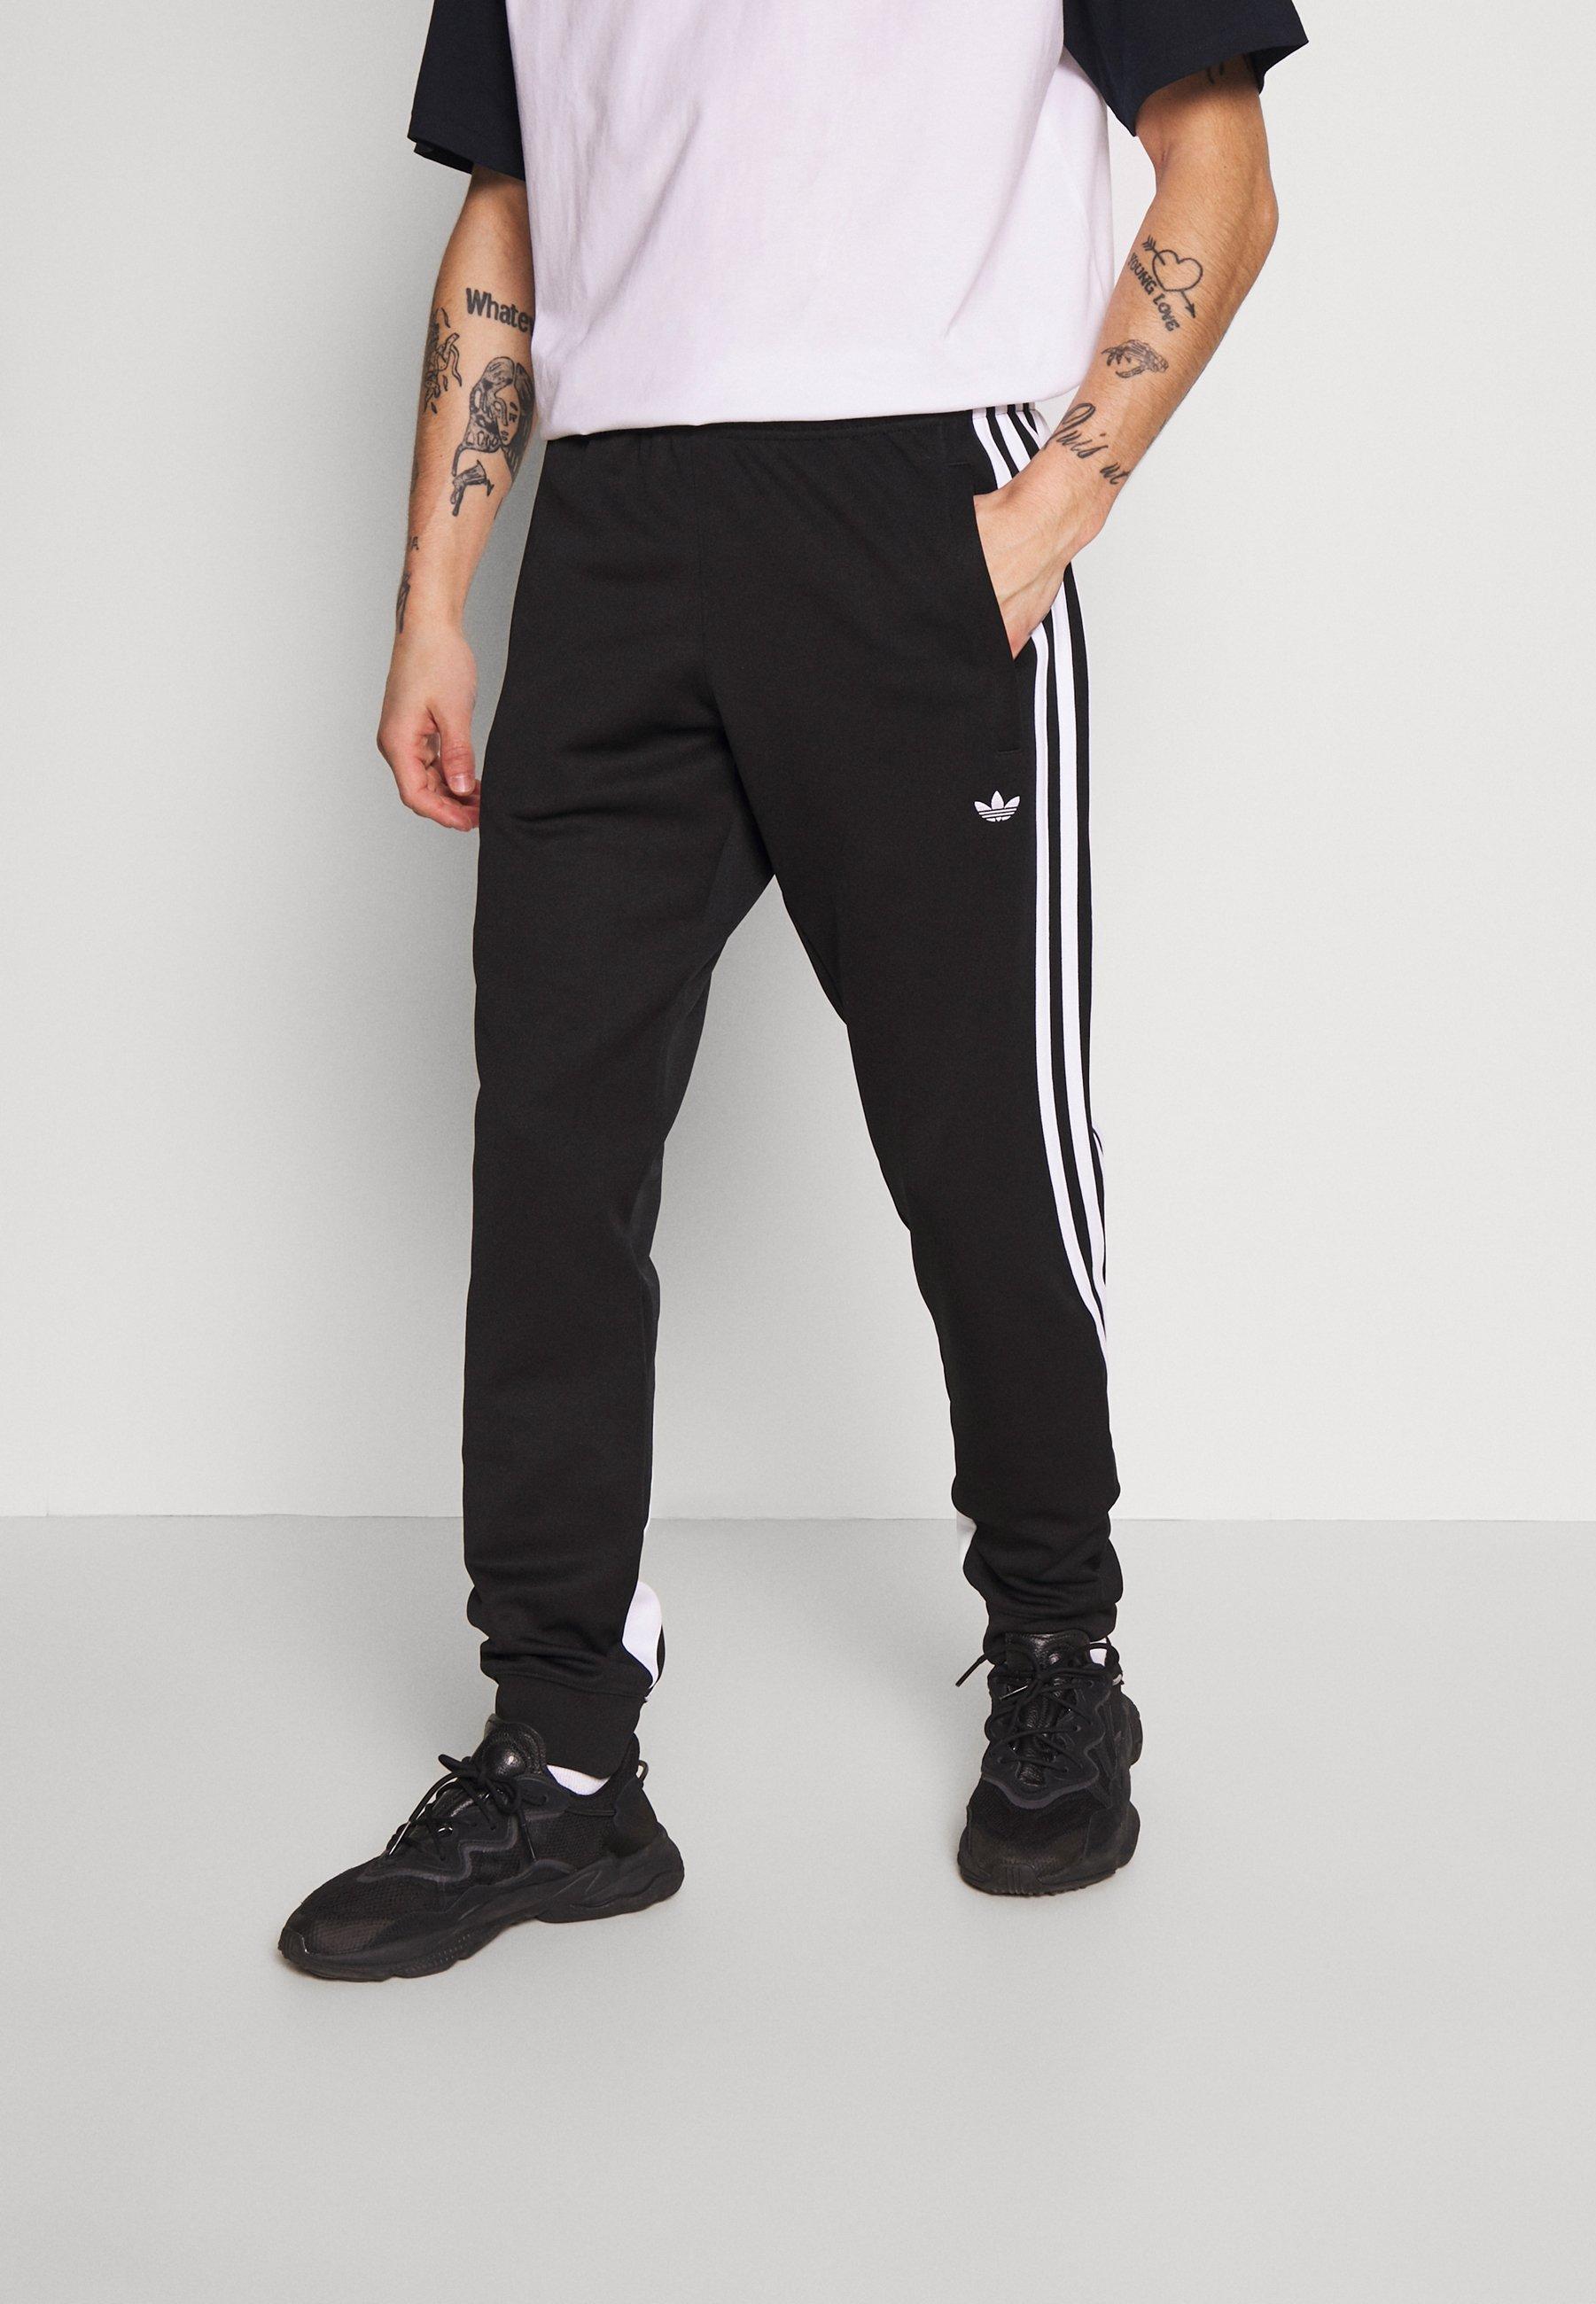 3STRIPES WRAP TRACK PANTS - Trainingsbroek - black/white